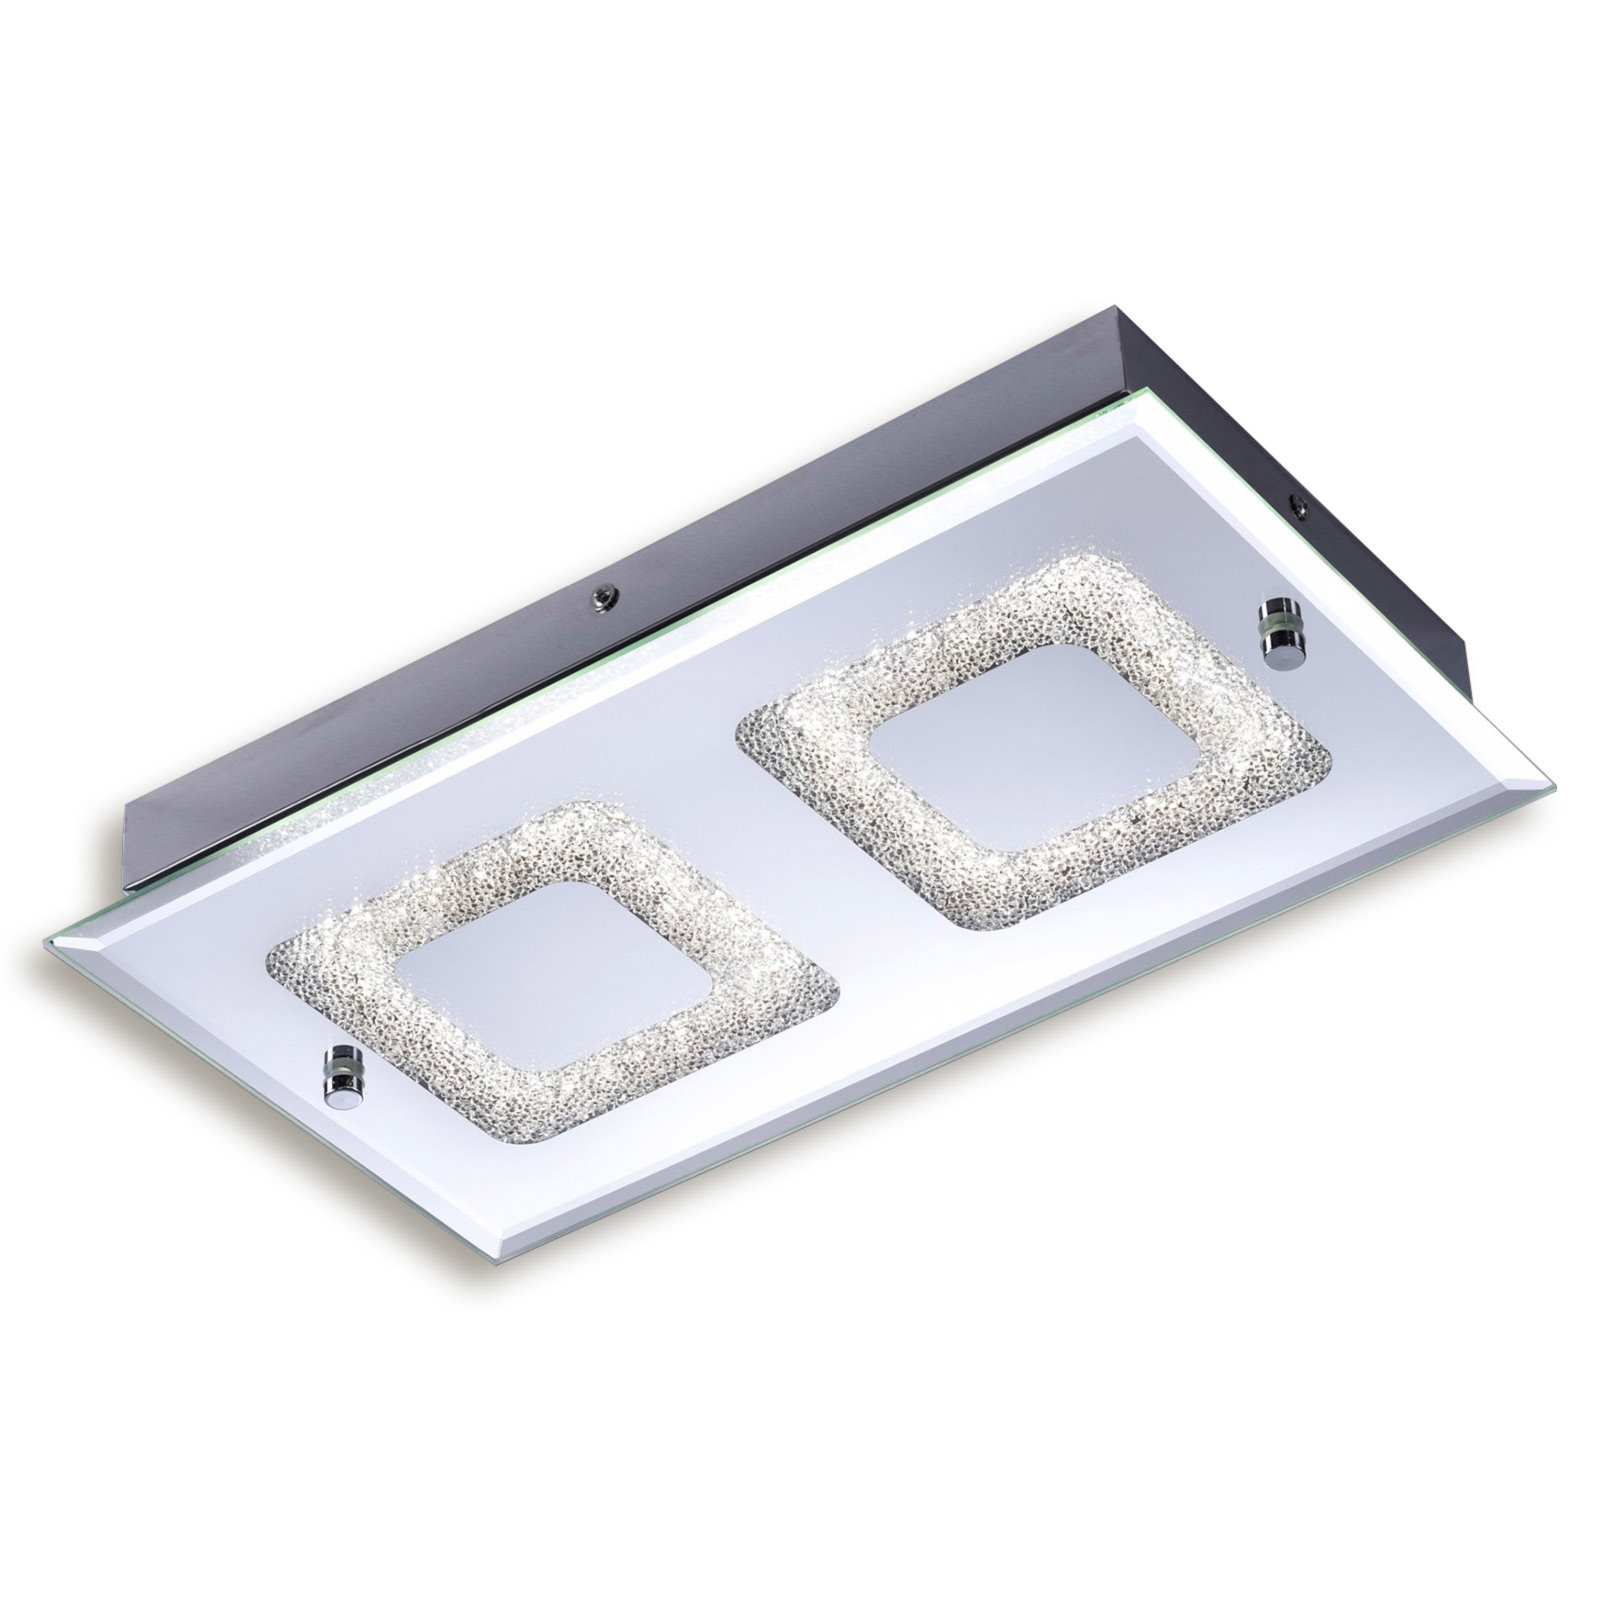 led deckenleuchte lisa chrom glas 36x20 cm led deckenleuchten deckenleuchten lampen. Black Bedroom Furniture Sets. Home Design Ideas